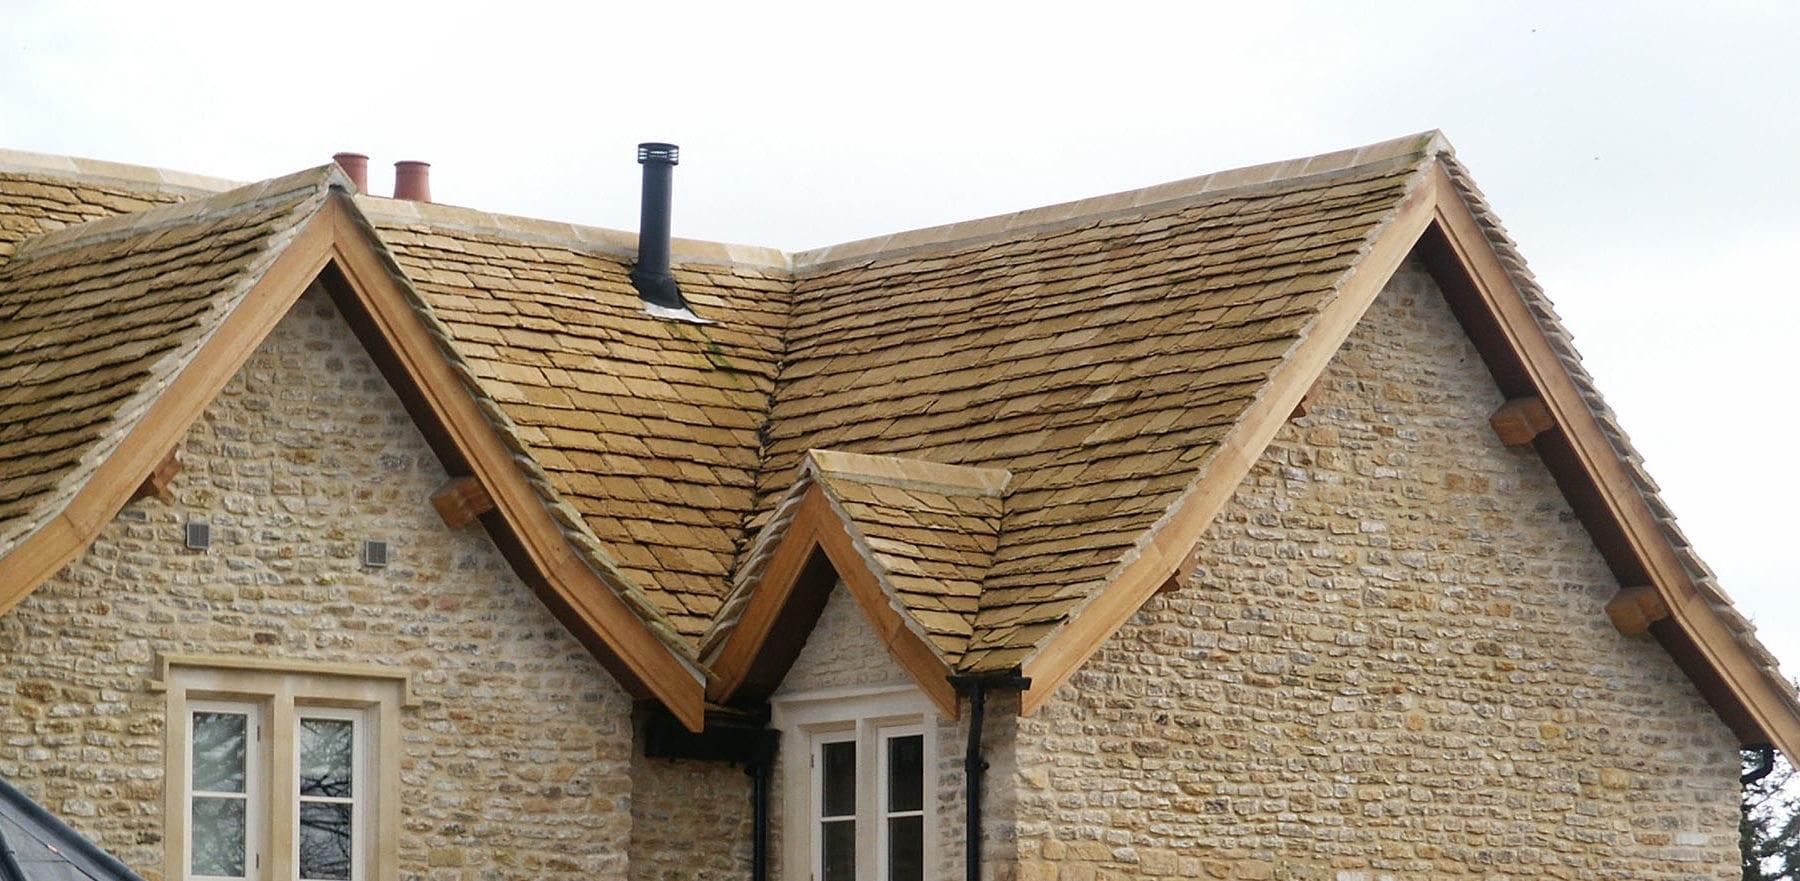 Lifestiles - Natural Stone Roof Tiles - On The Marsh, England 2